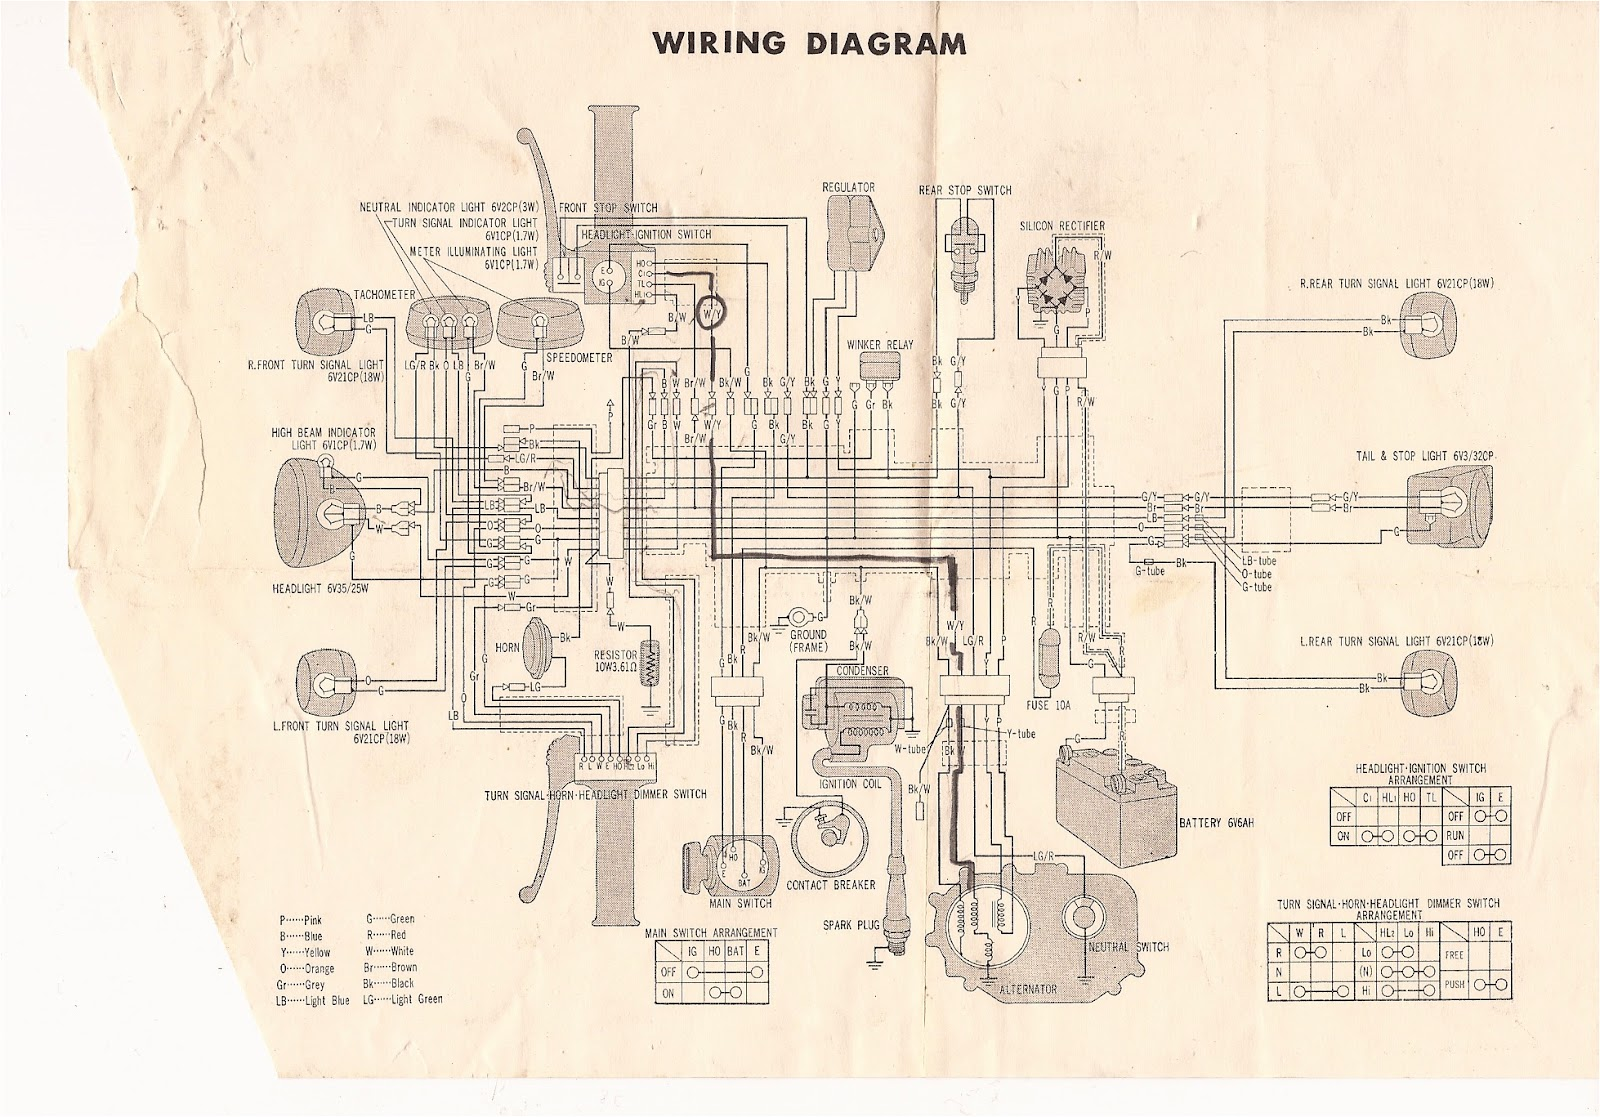 1981 Yamaha Xt250 Wiring Diagram Bmw X5 E53 Stereo R4l Xl350 And Xl250